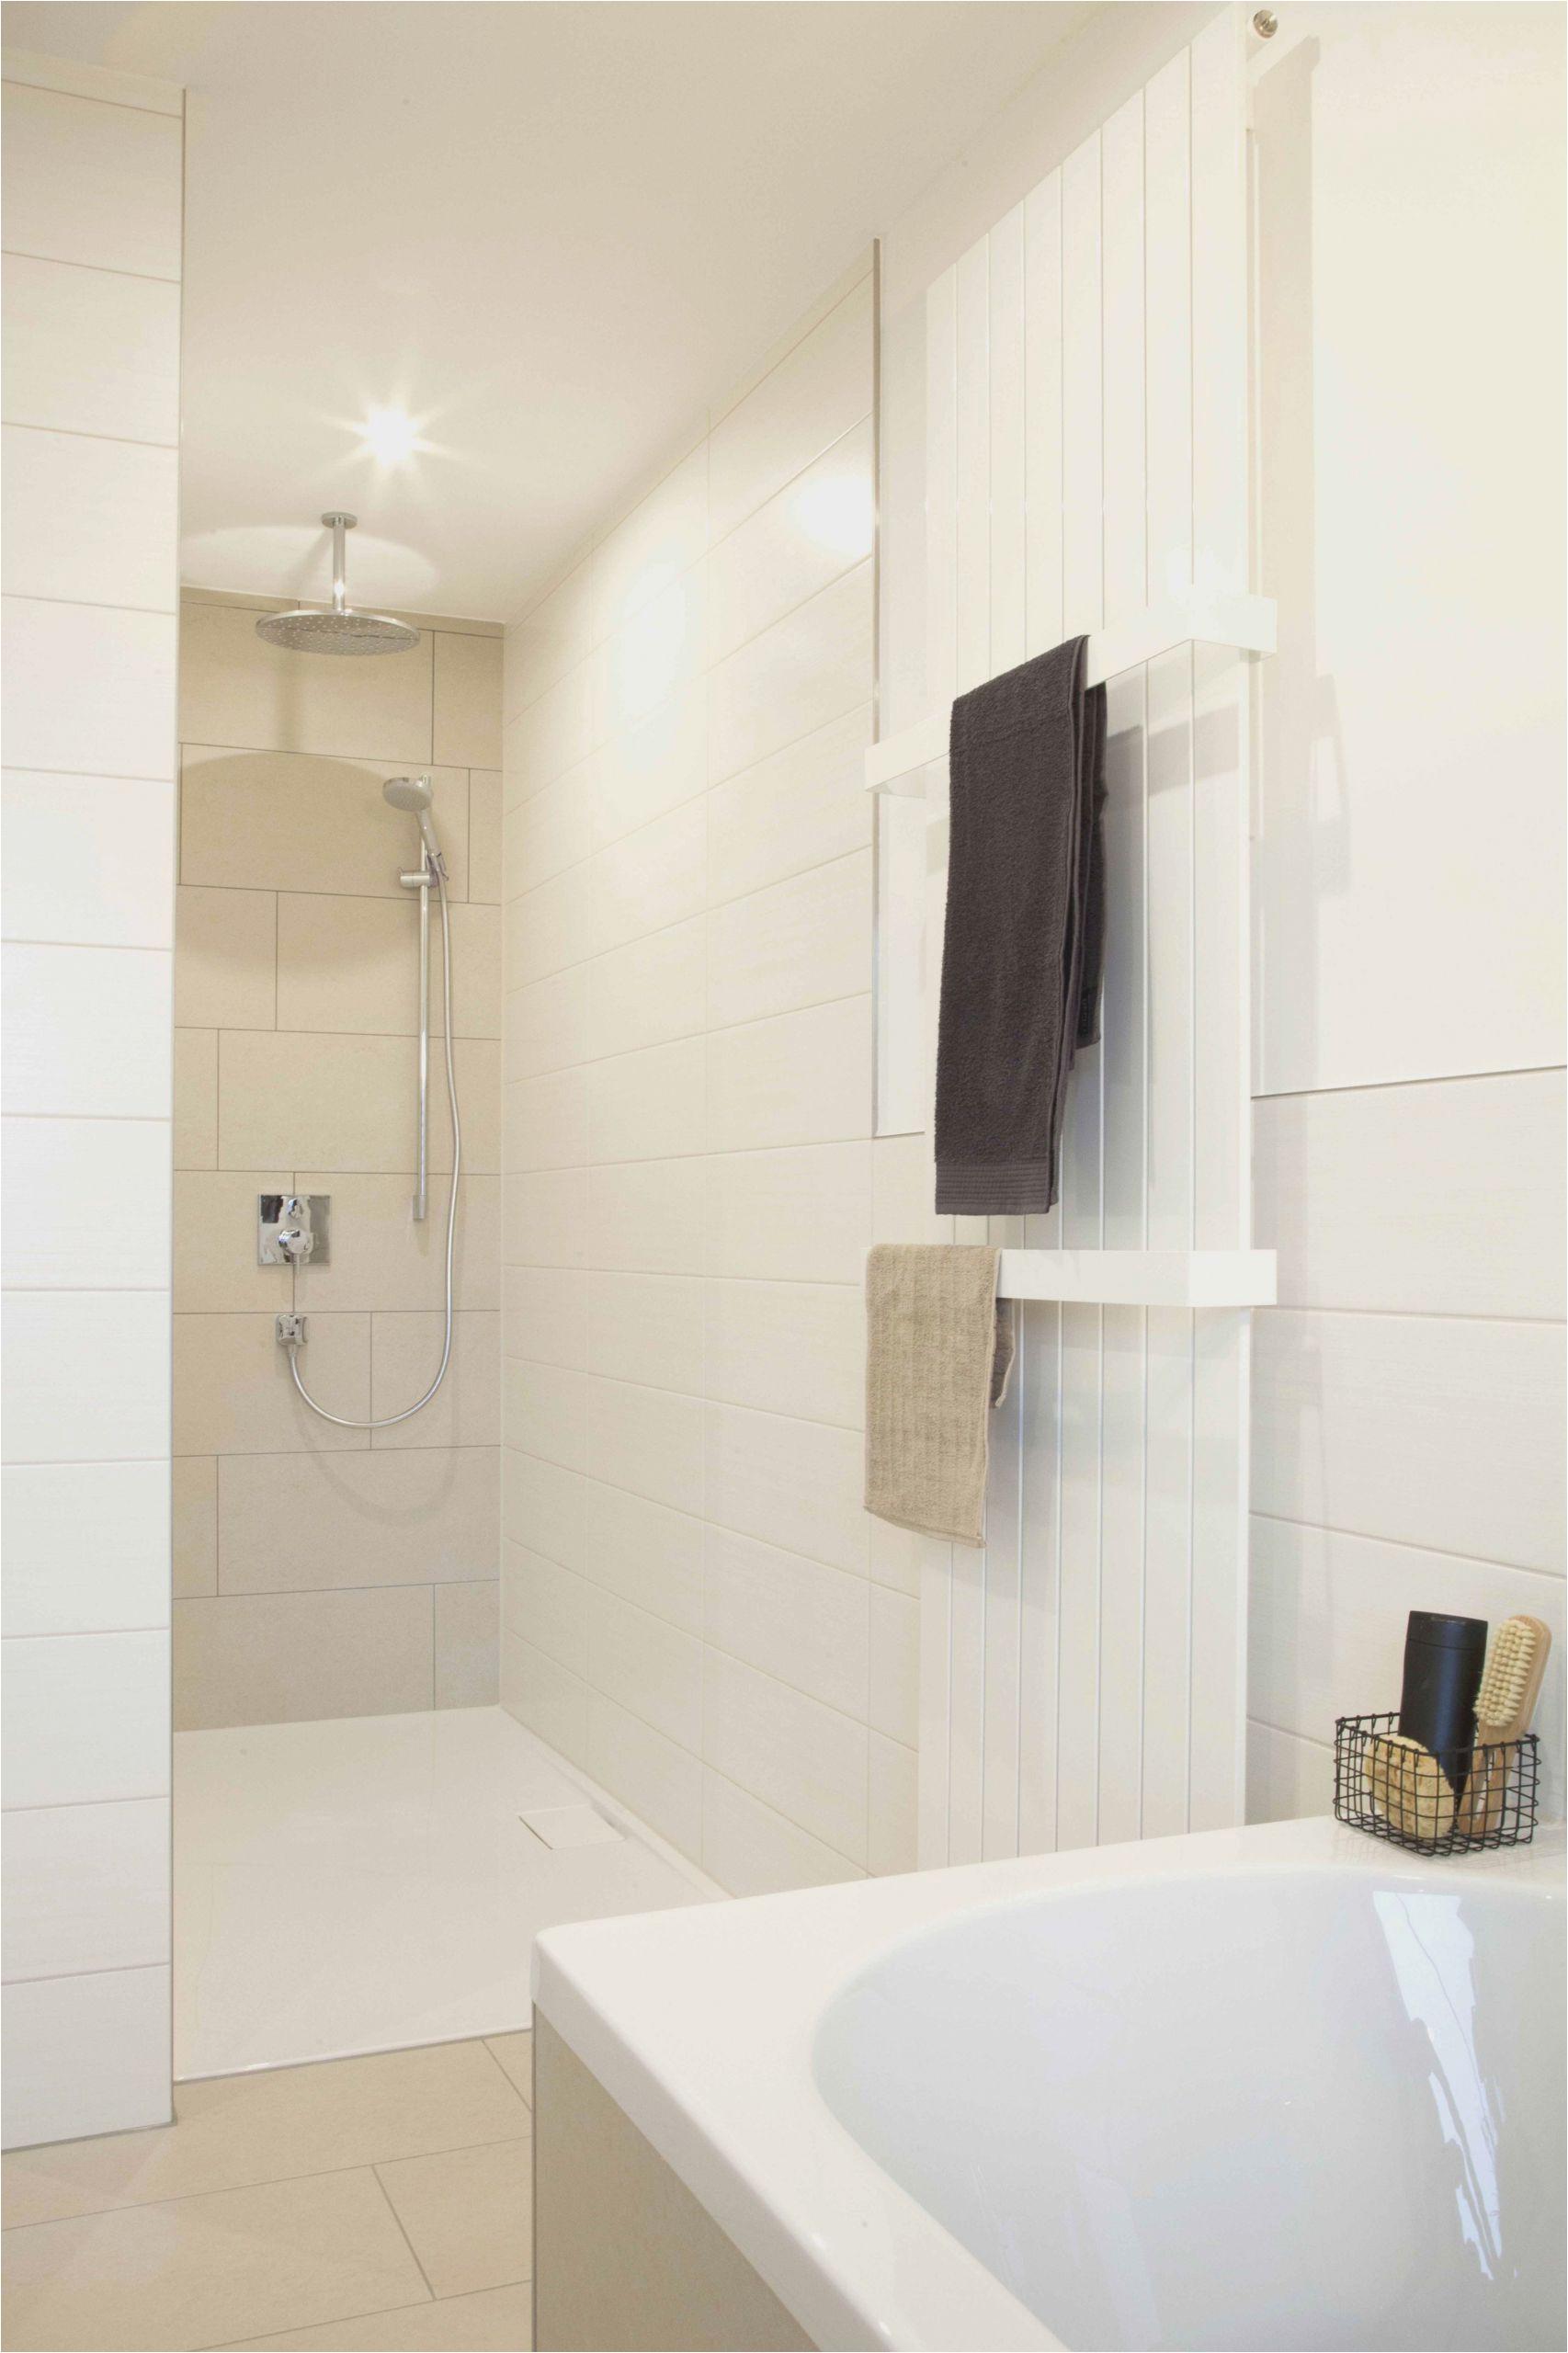 otto badezimmer neu waschmaschine im badezimmer temobardz home blog of otto badezimmer scaled